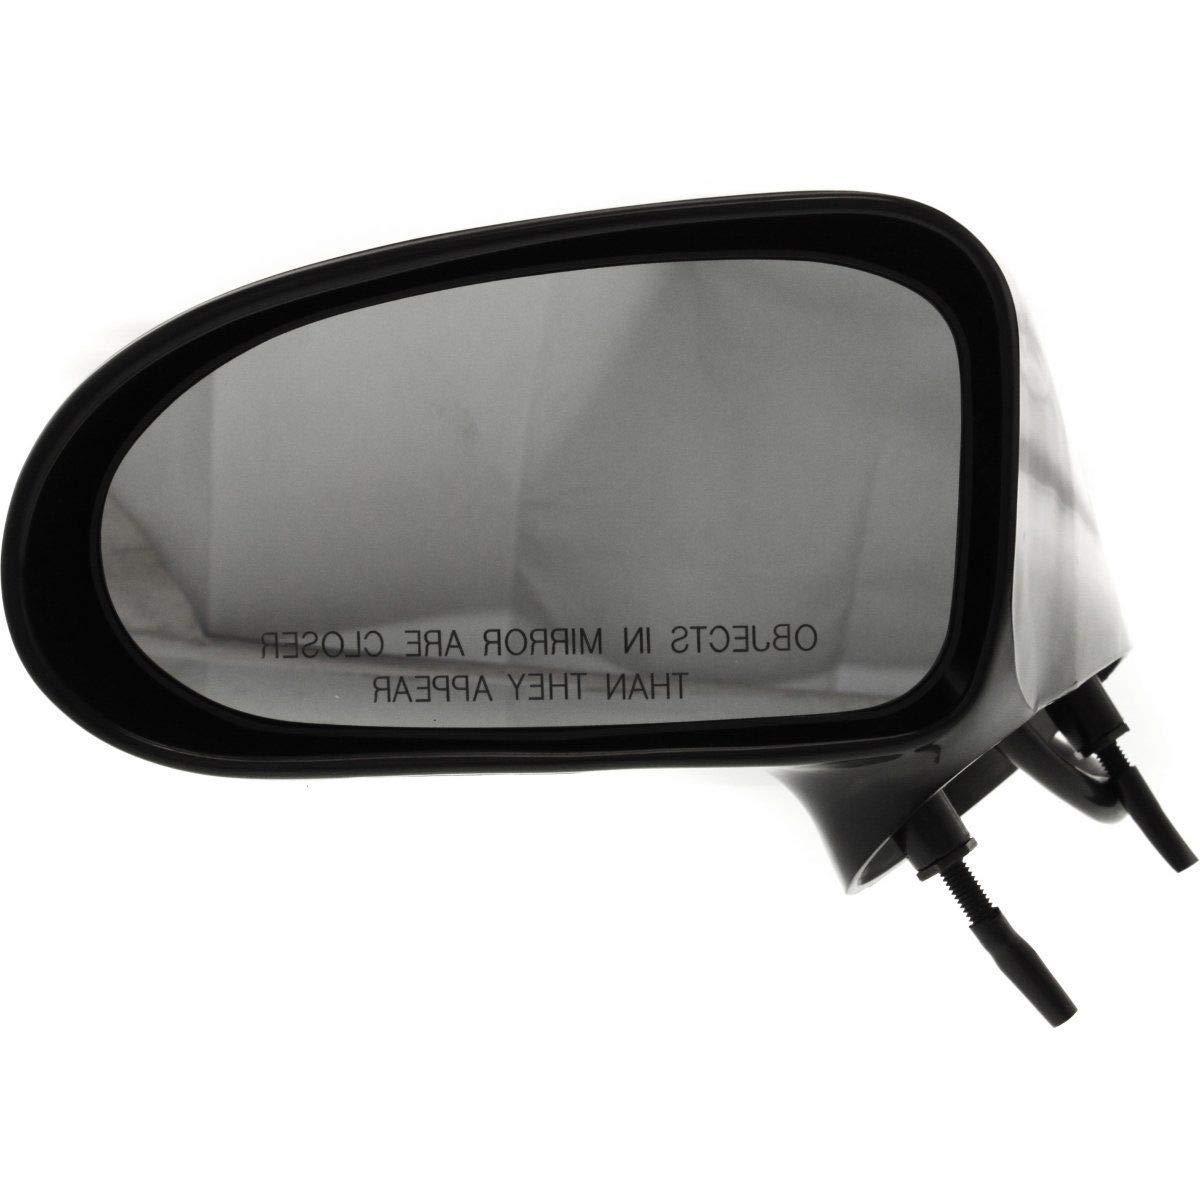 Kool Vue Power Mirror For 92-99 Buick LeSabre 91-96 Park Avenue Driver Side